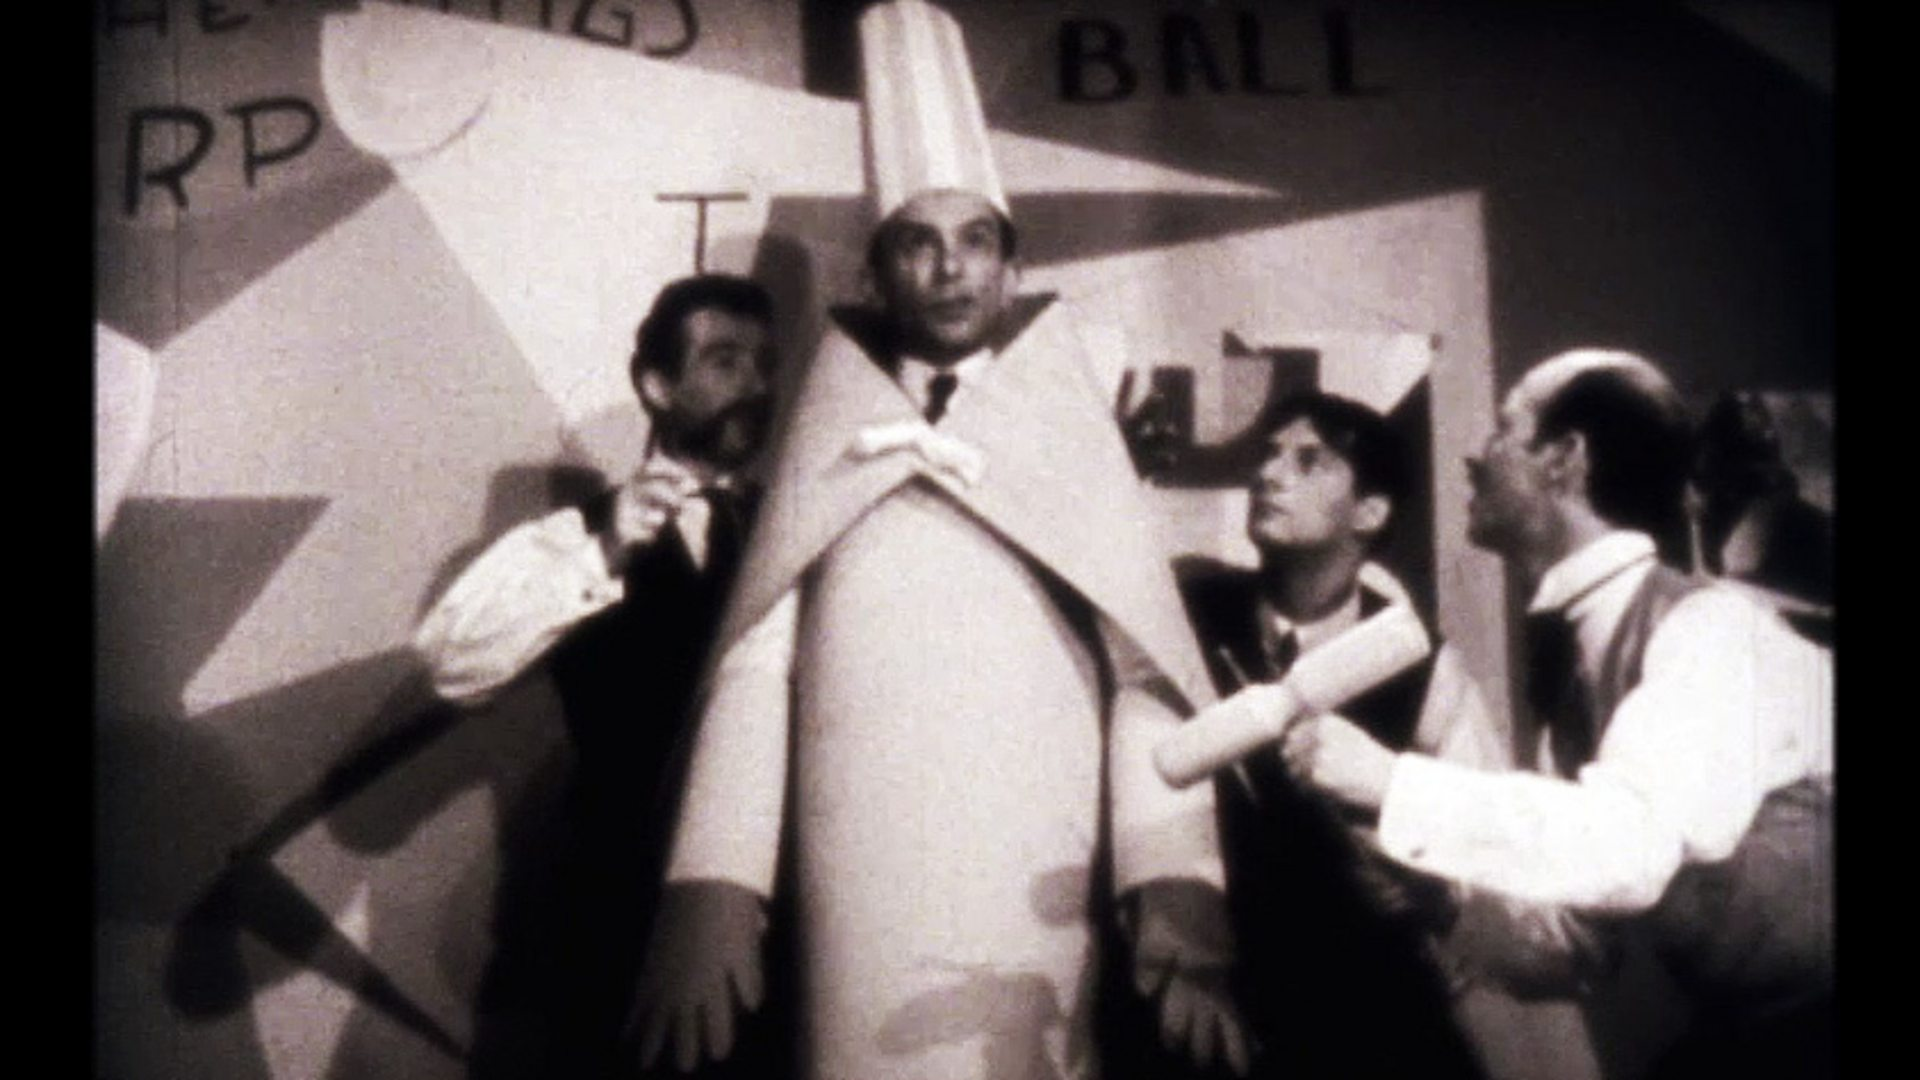 bbc arts bbc arts anarchy absurdity dada the cabaret